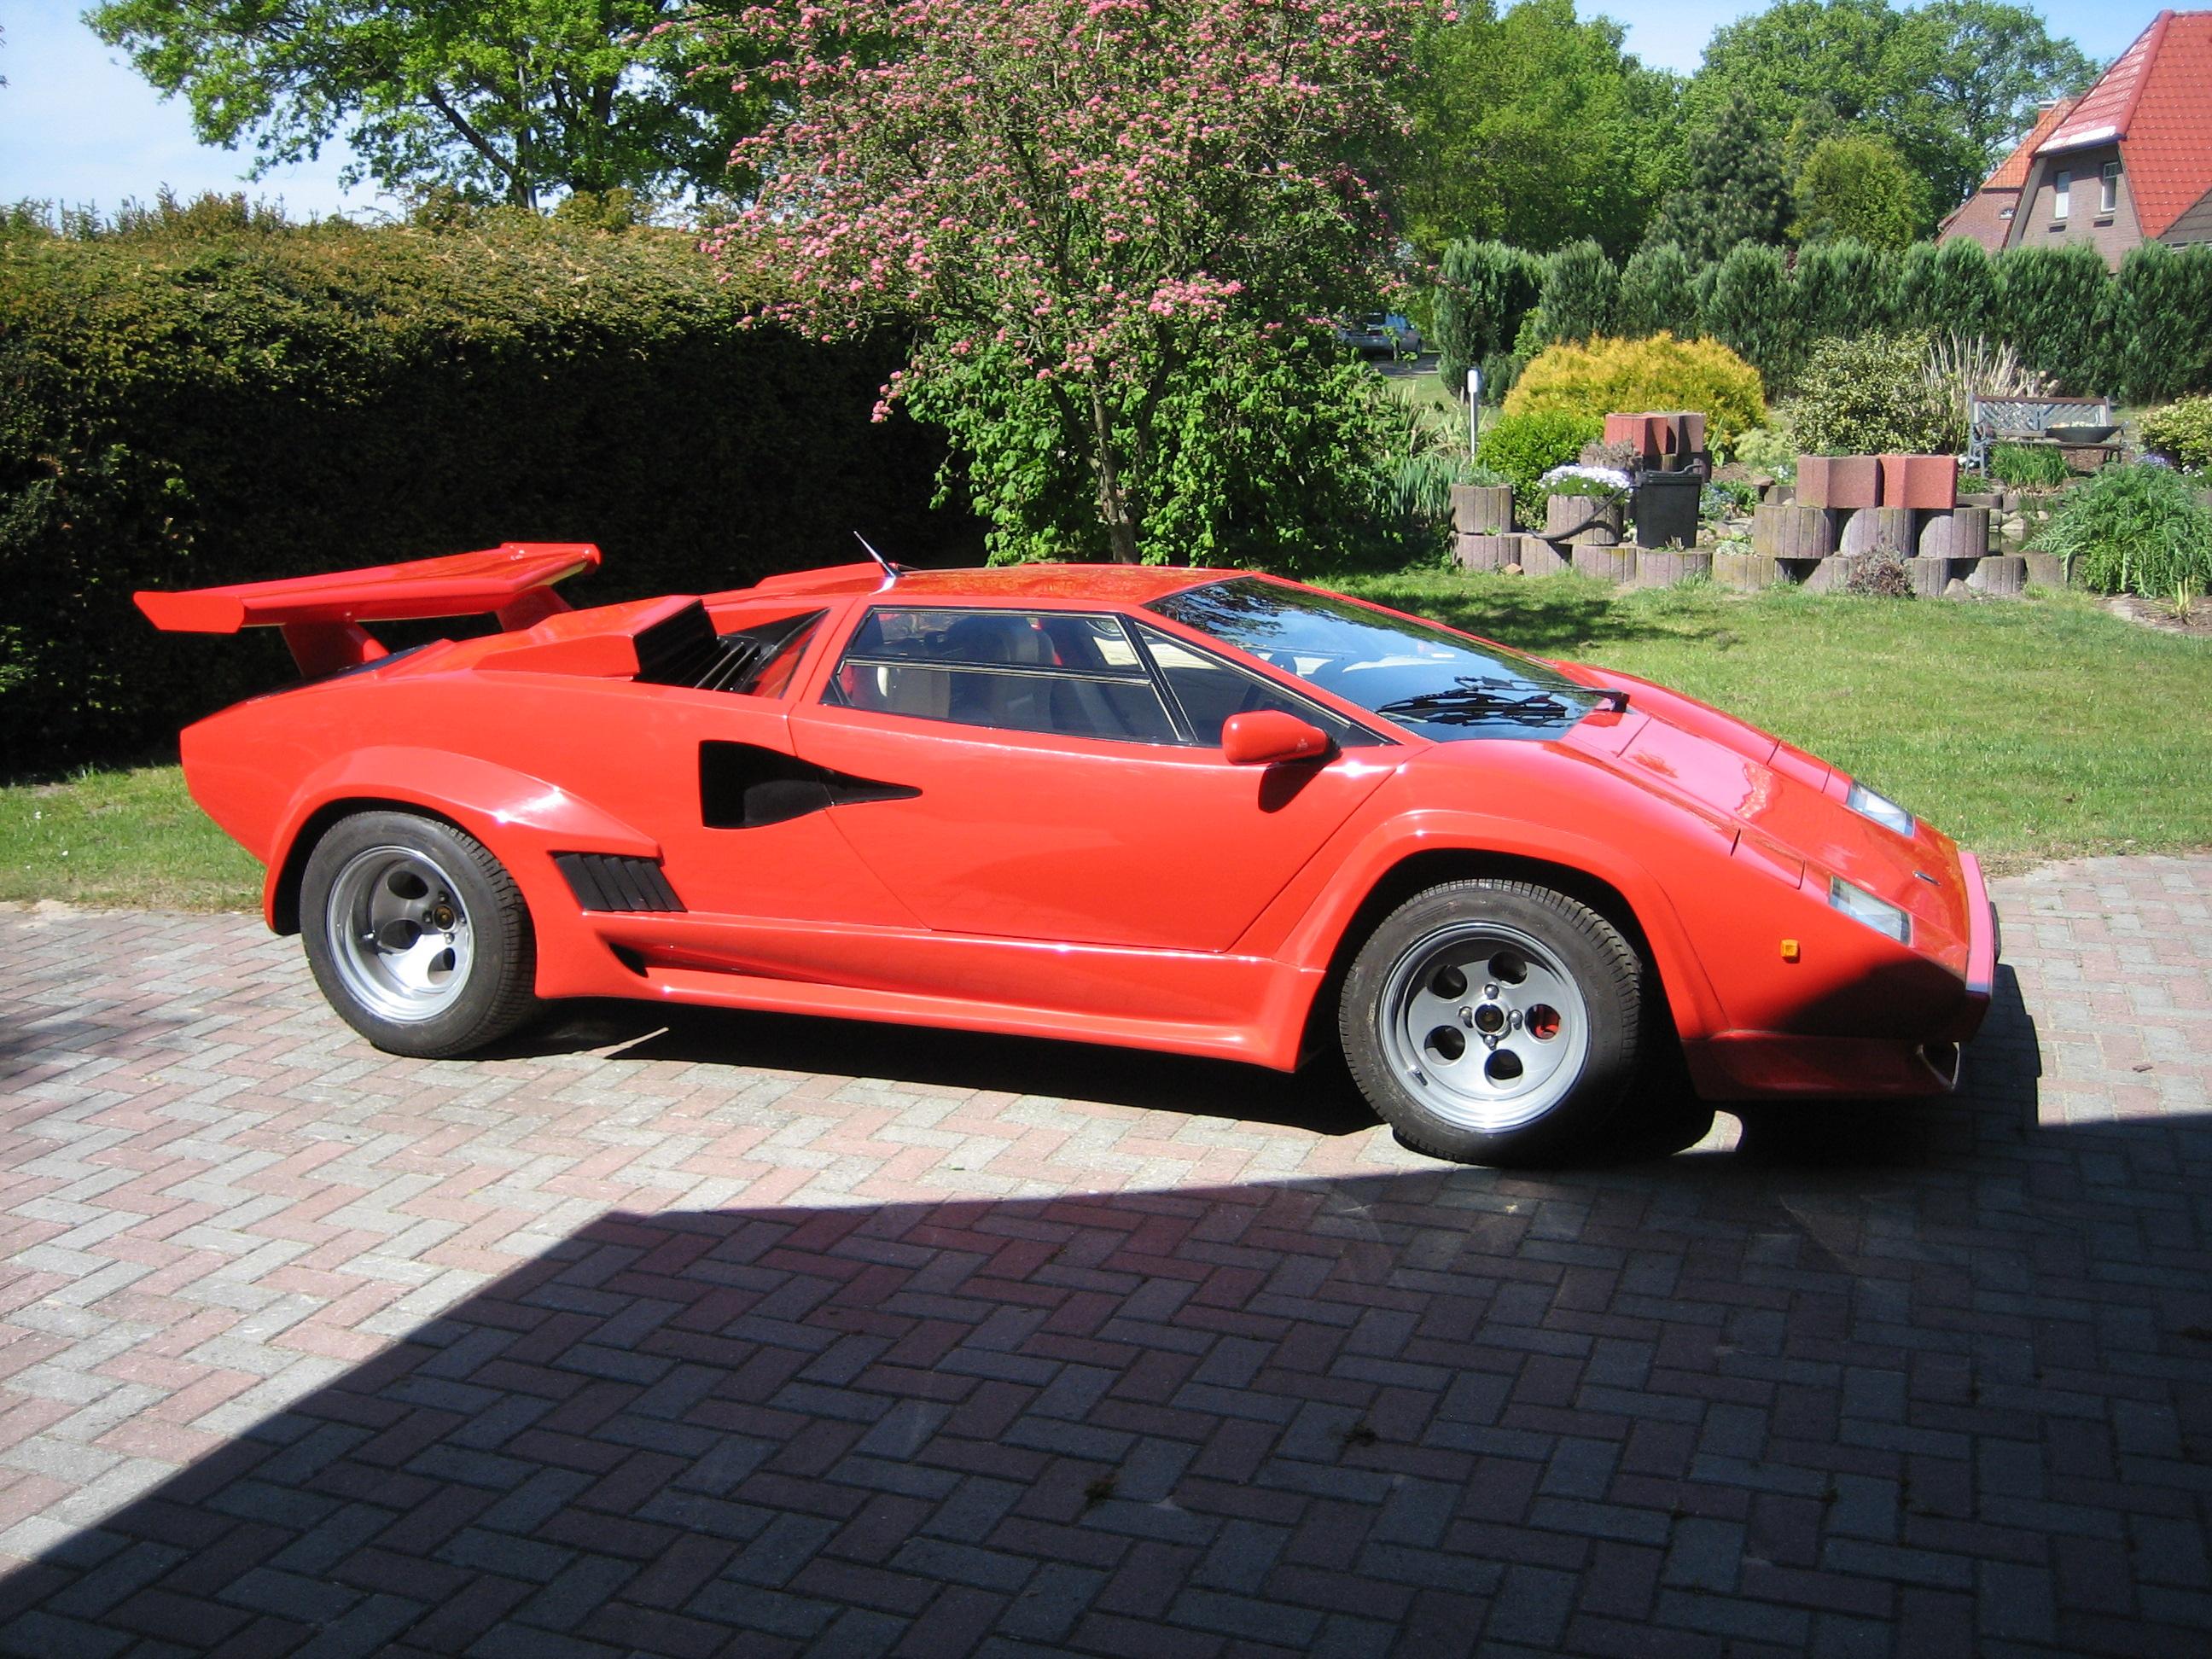 IMG_6523_0 Wonderful Lamborghini Countach Strohm De Rella Cars Trend